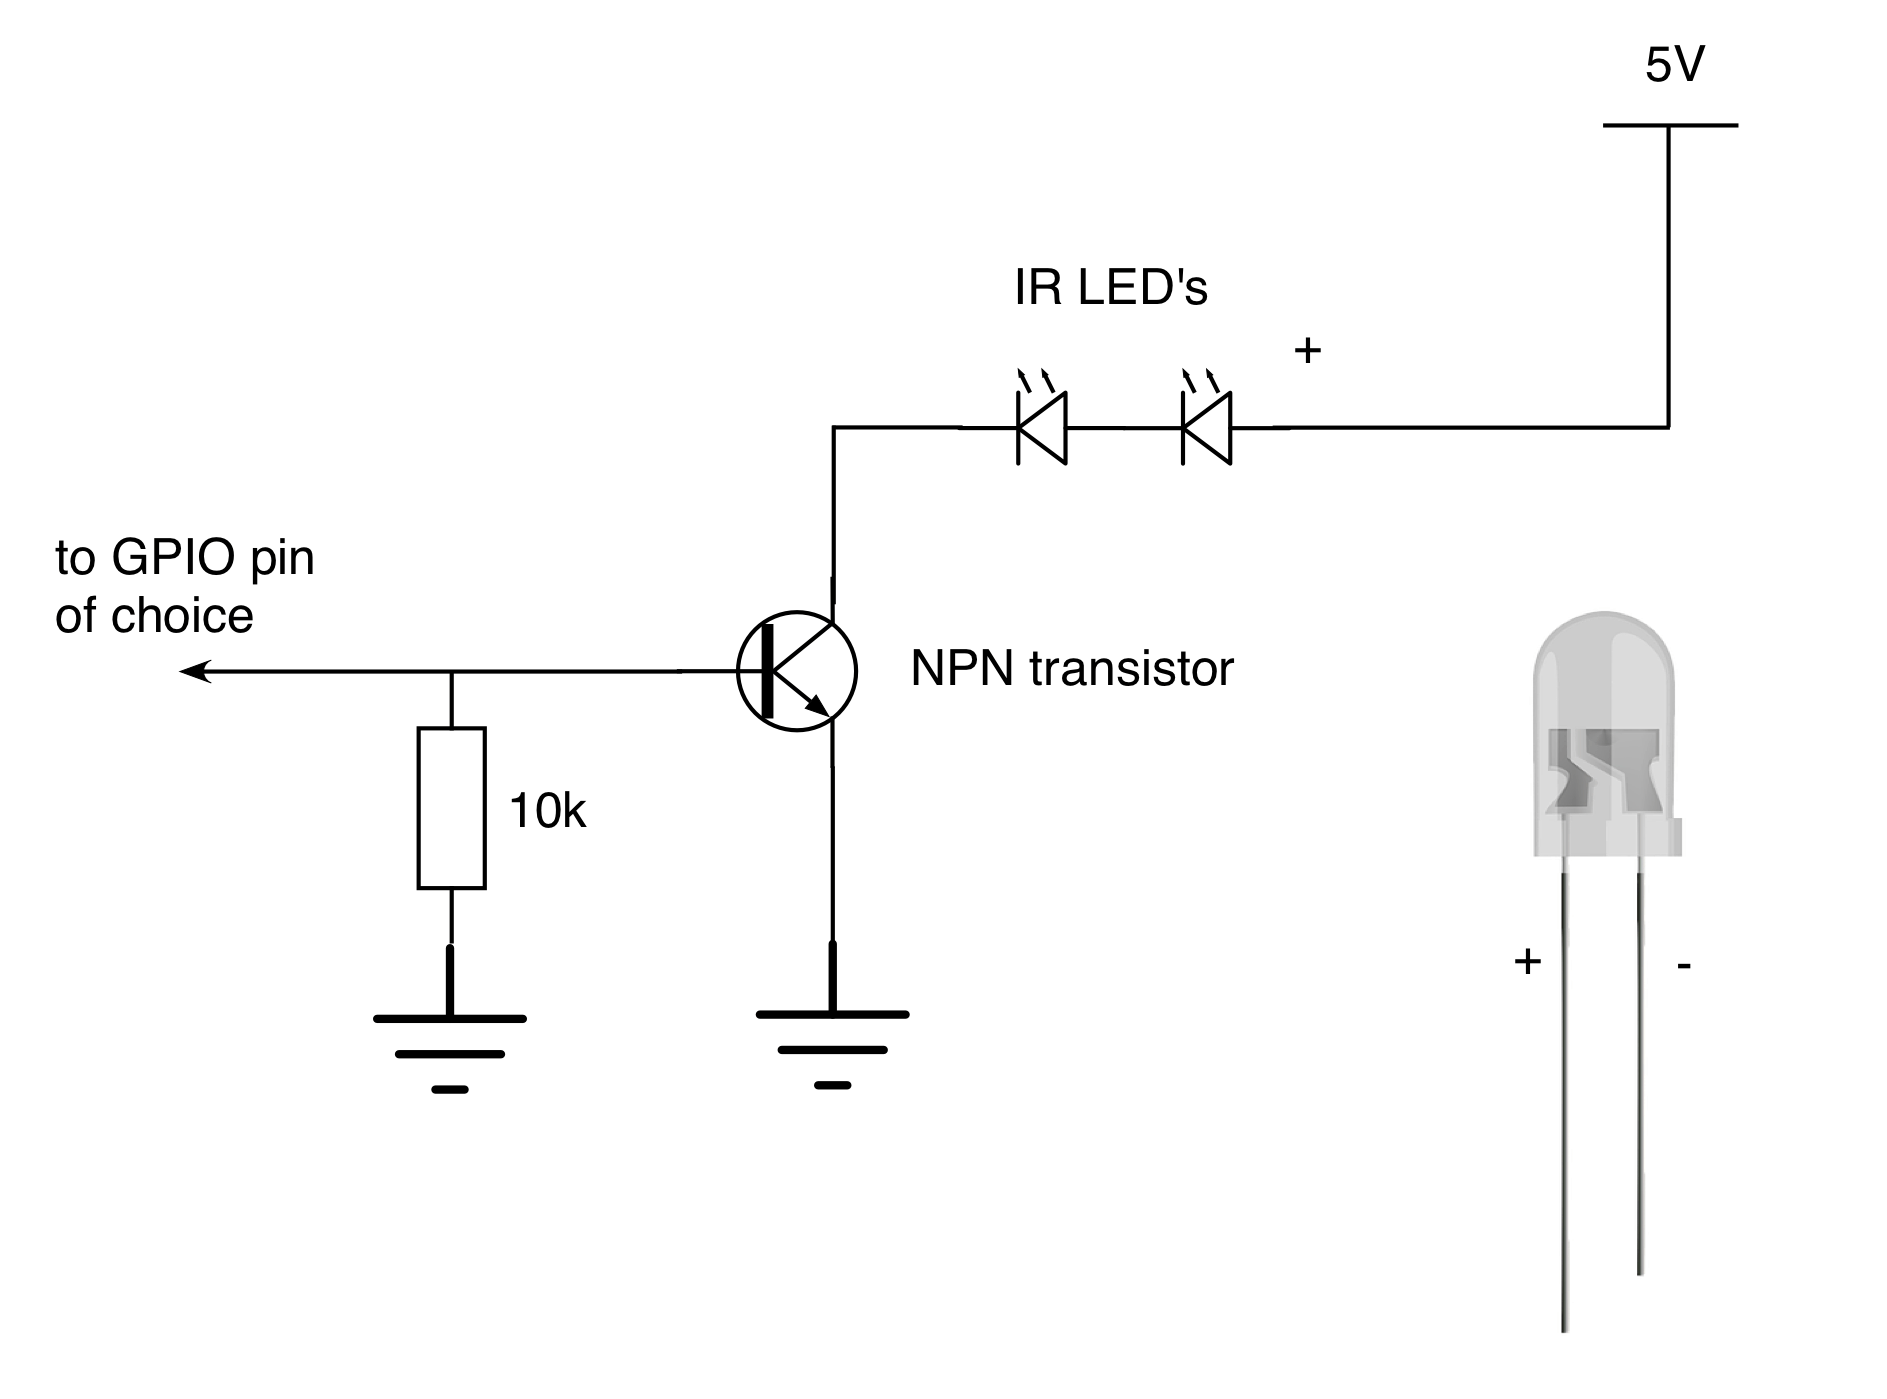 wiringpi lcd clock